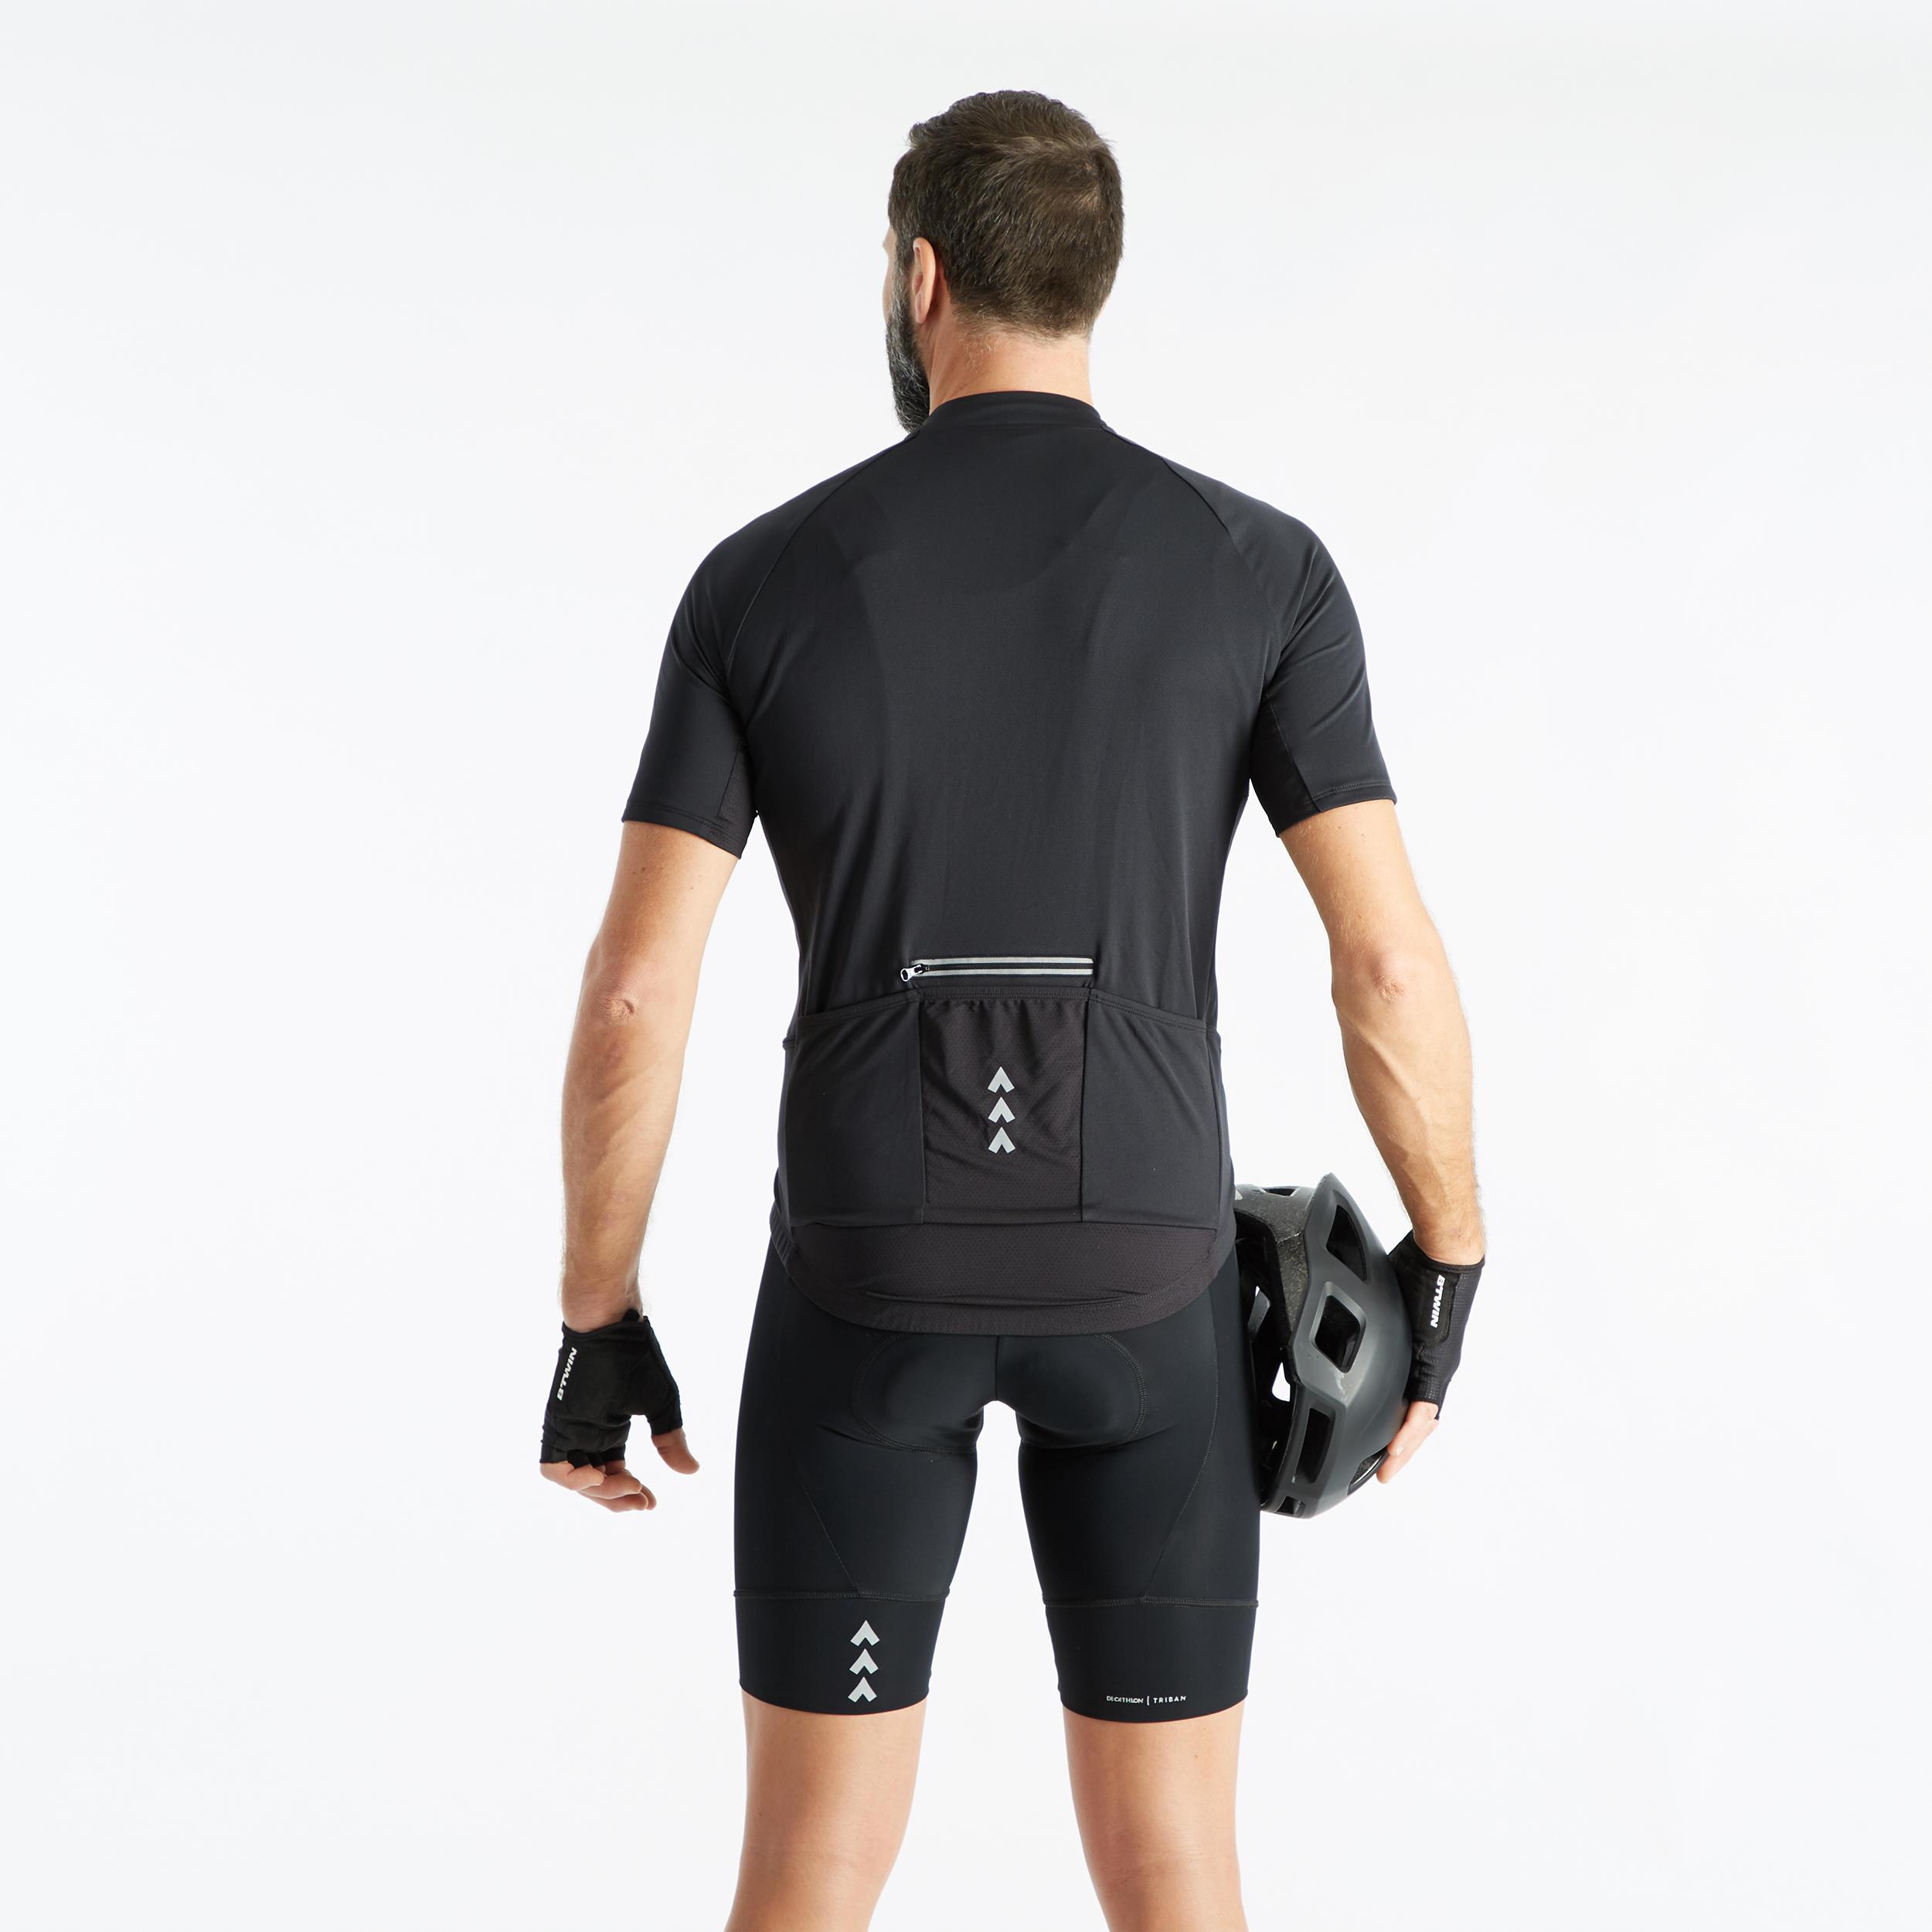 RC 100 Road Cycling and Bike Touring Bibless Shorts - Black